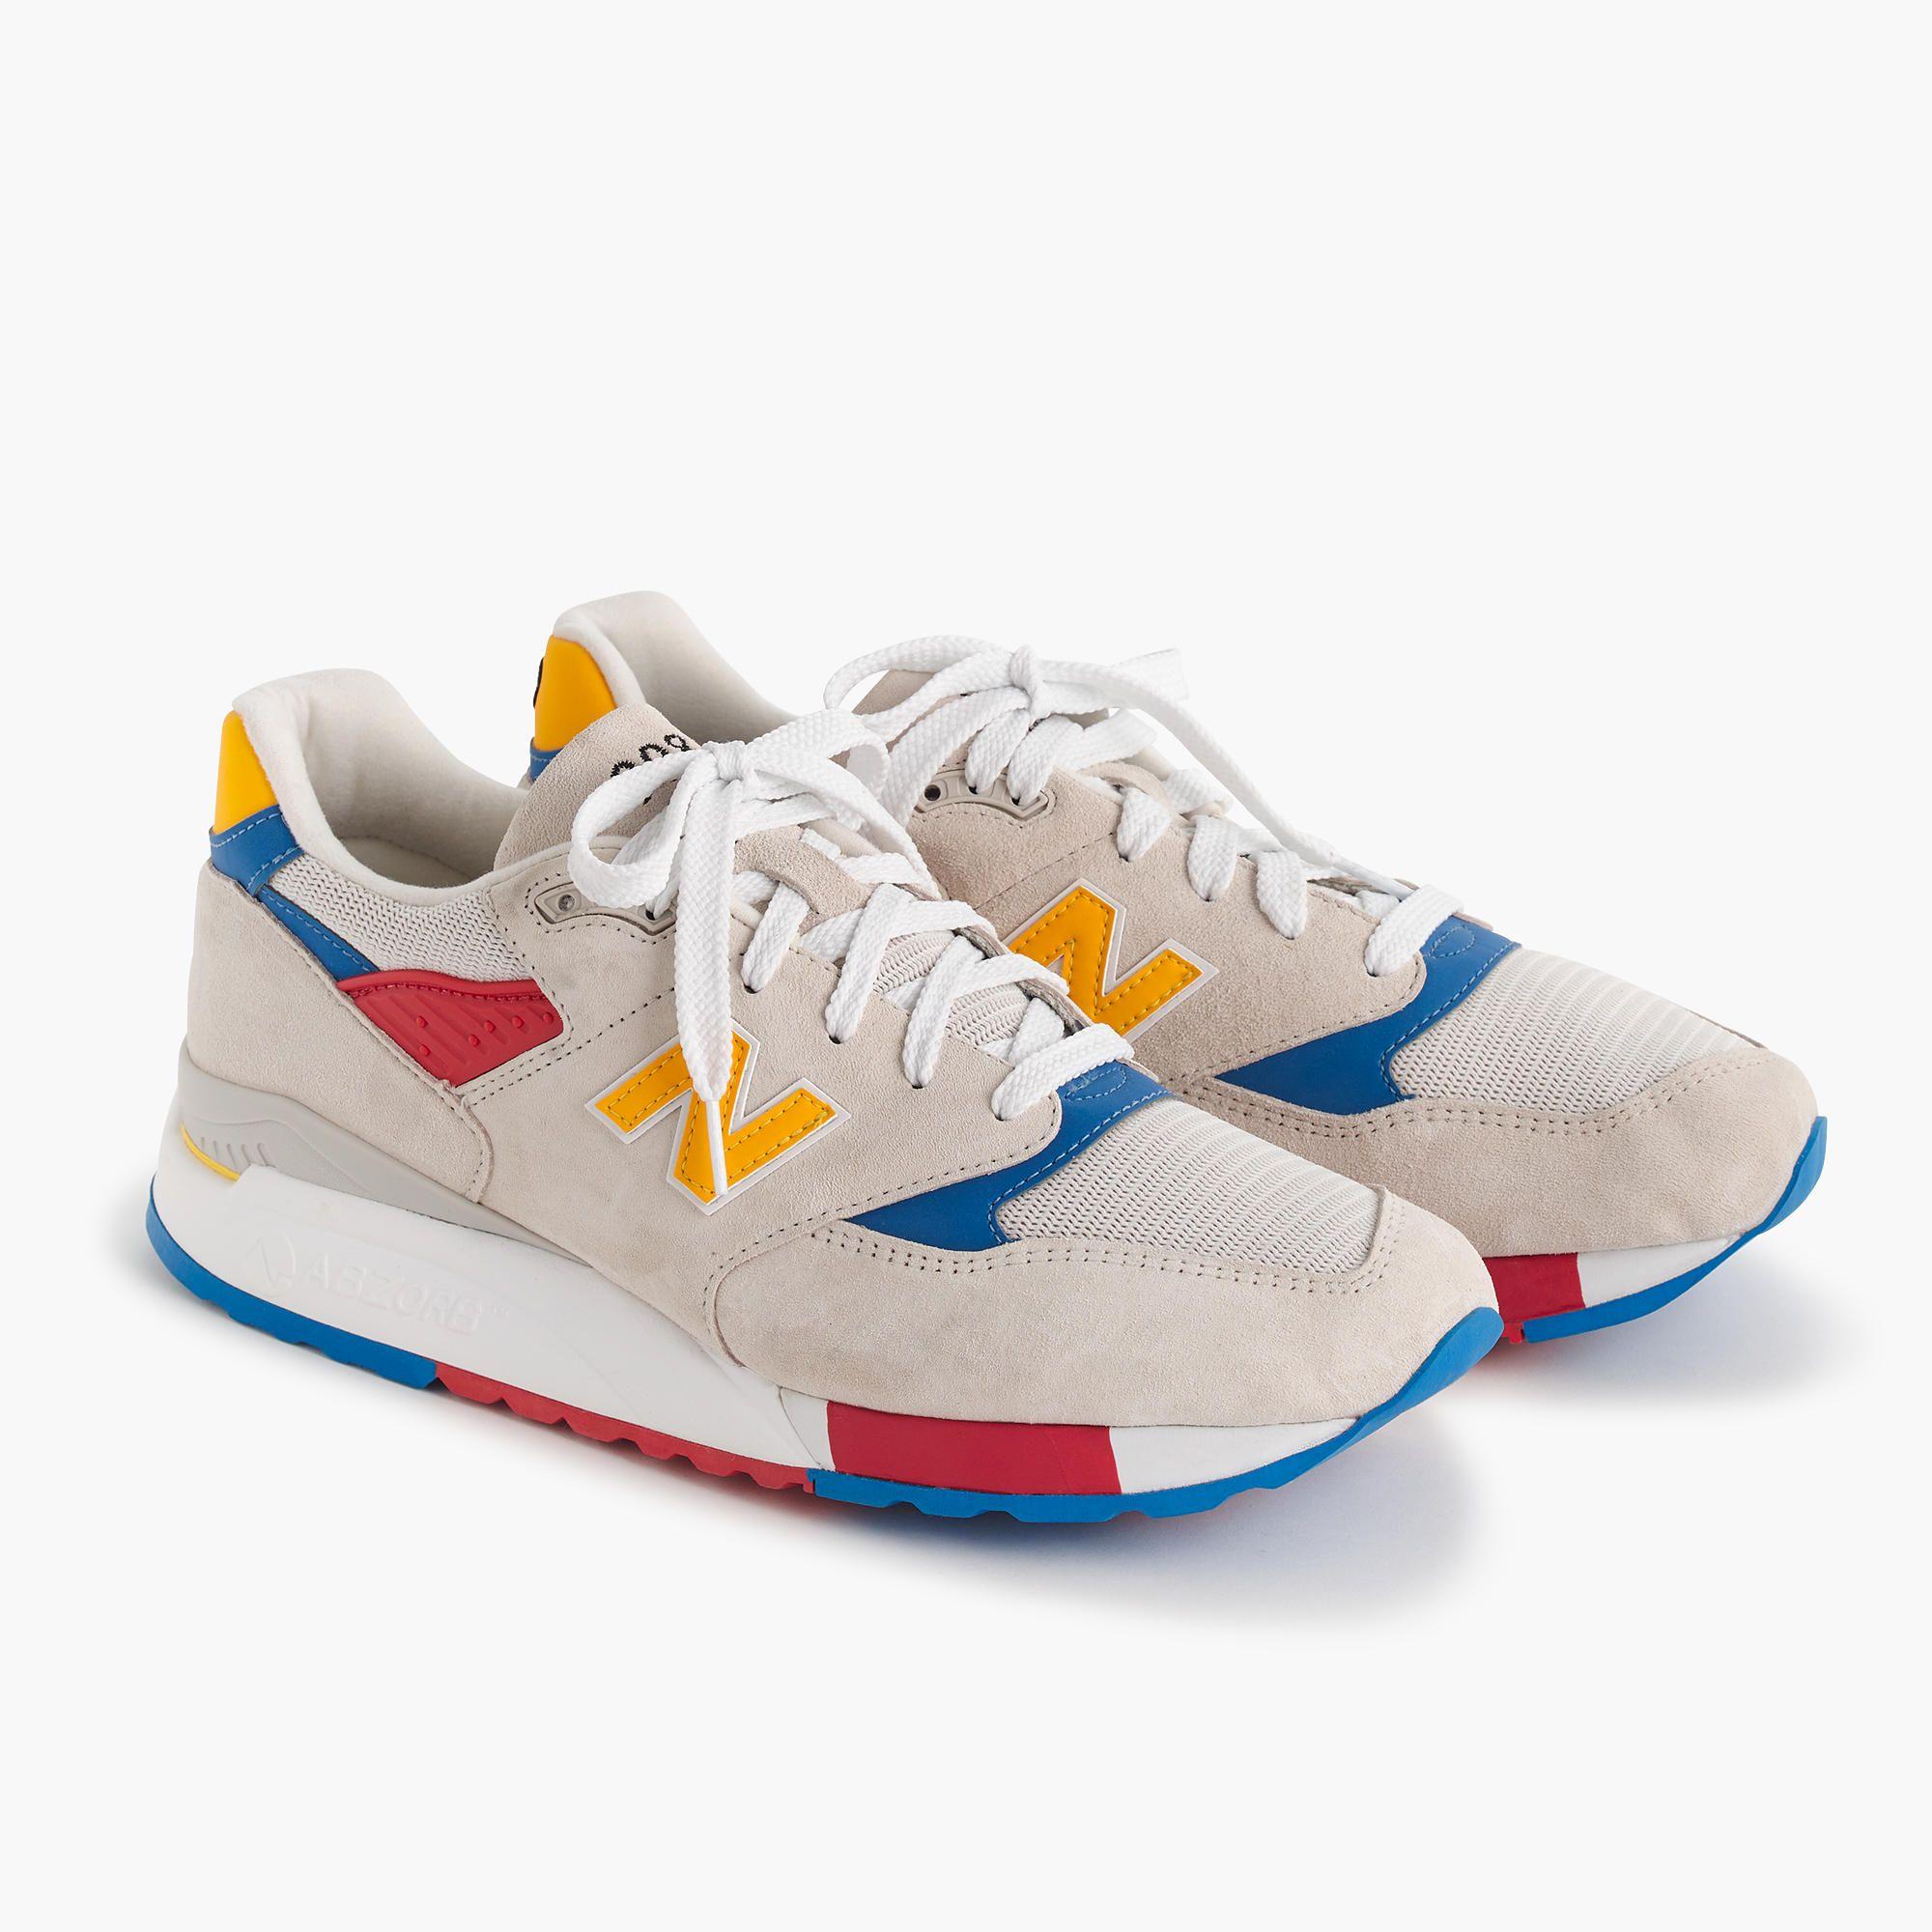 Men's Footwear | J.Crew. New Balance ...